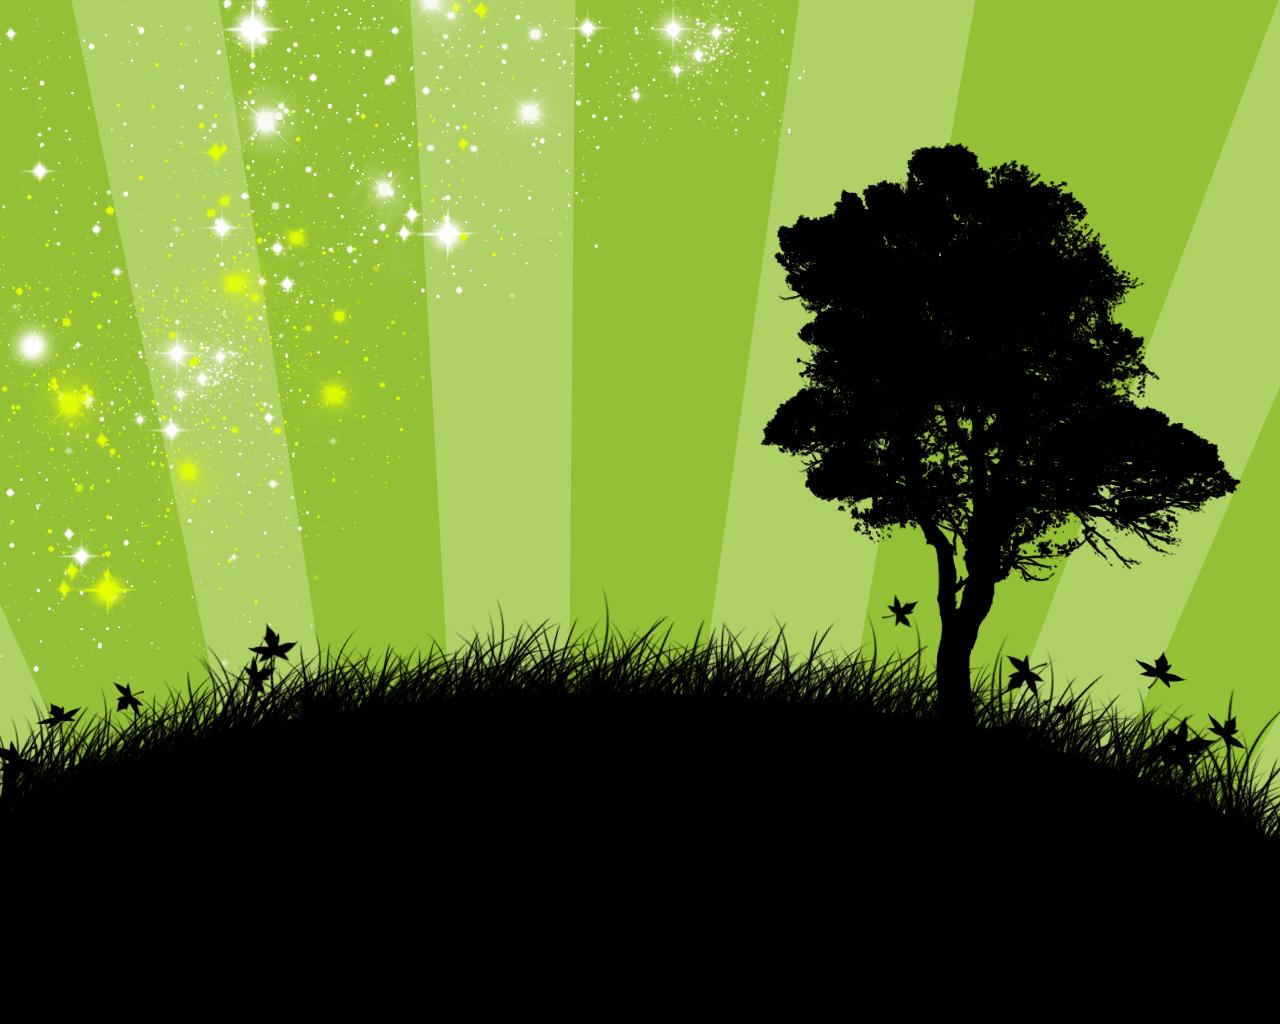 green 1280x1024